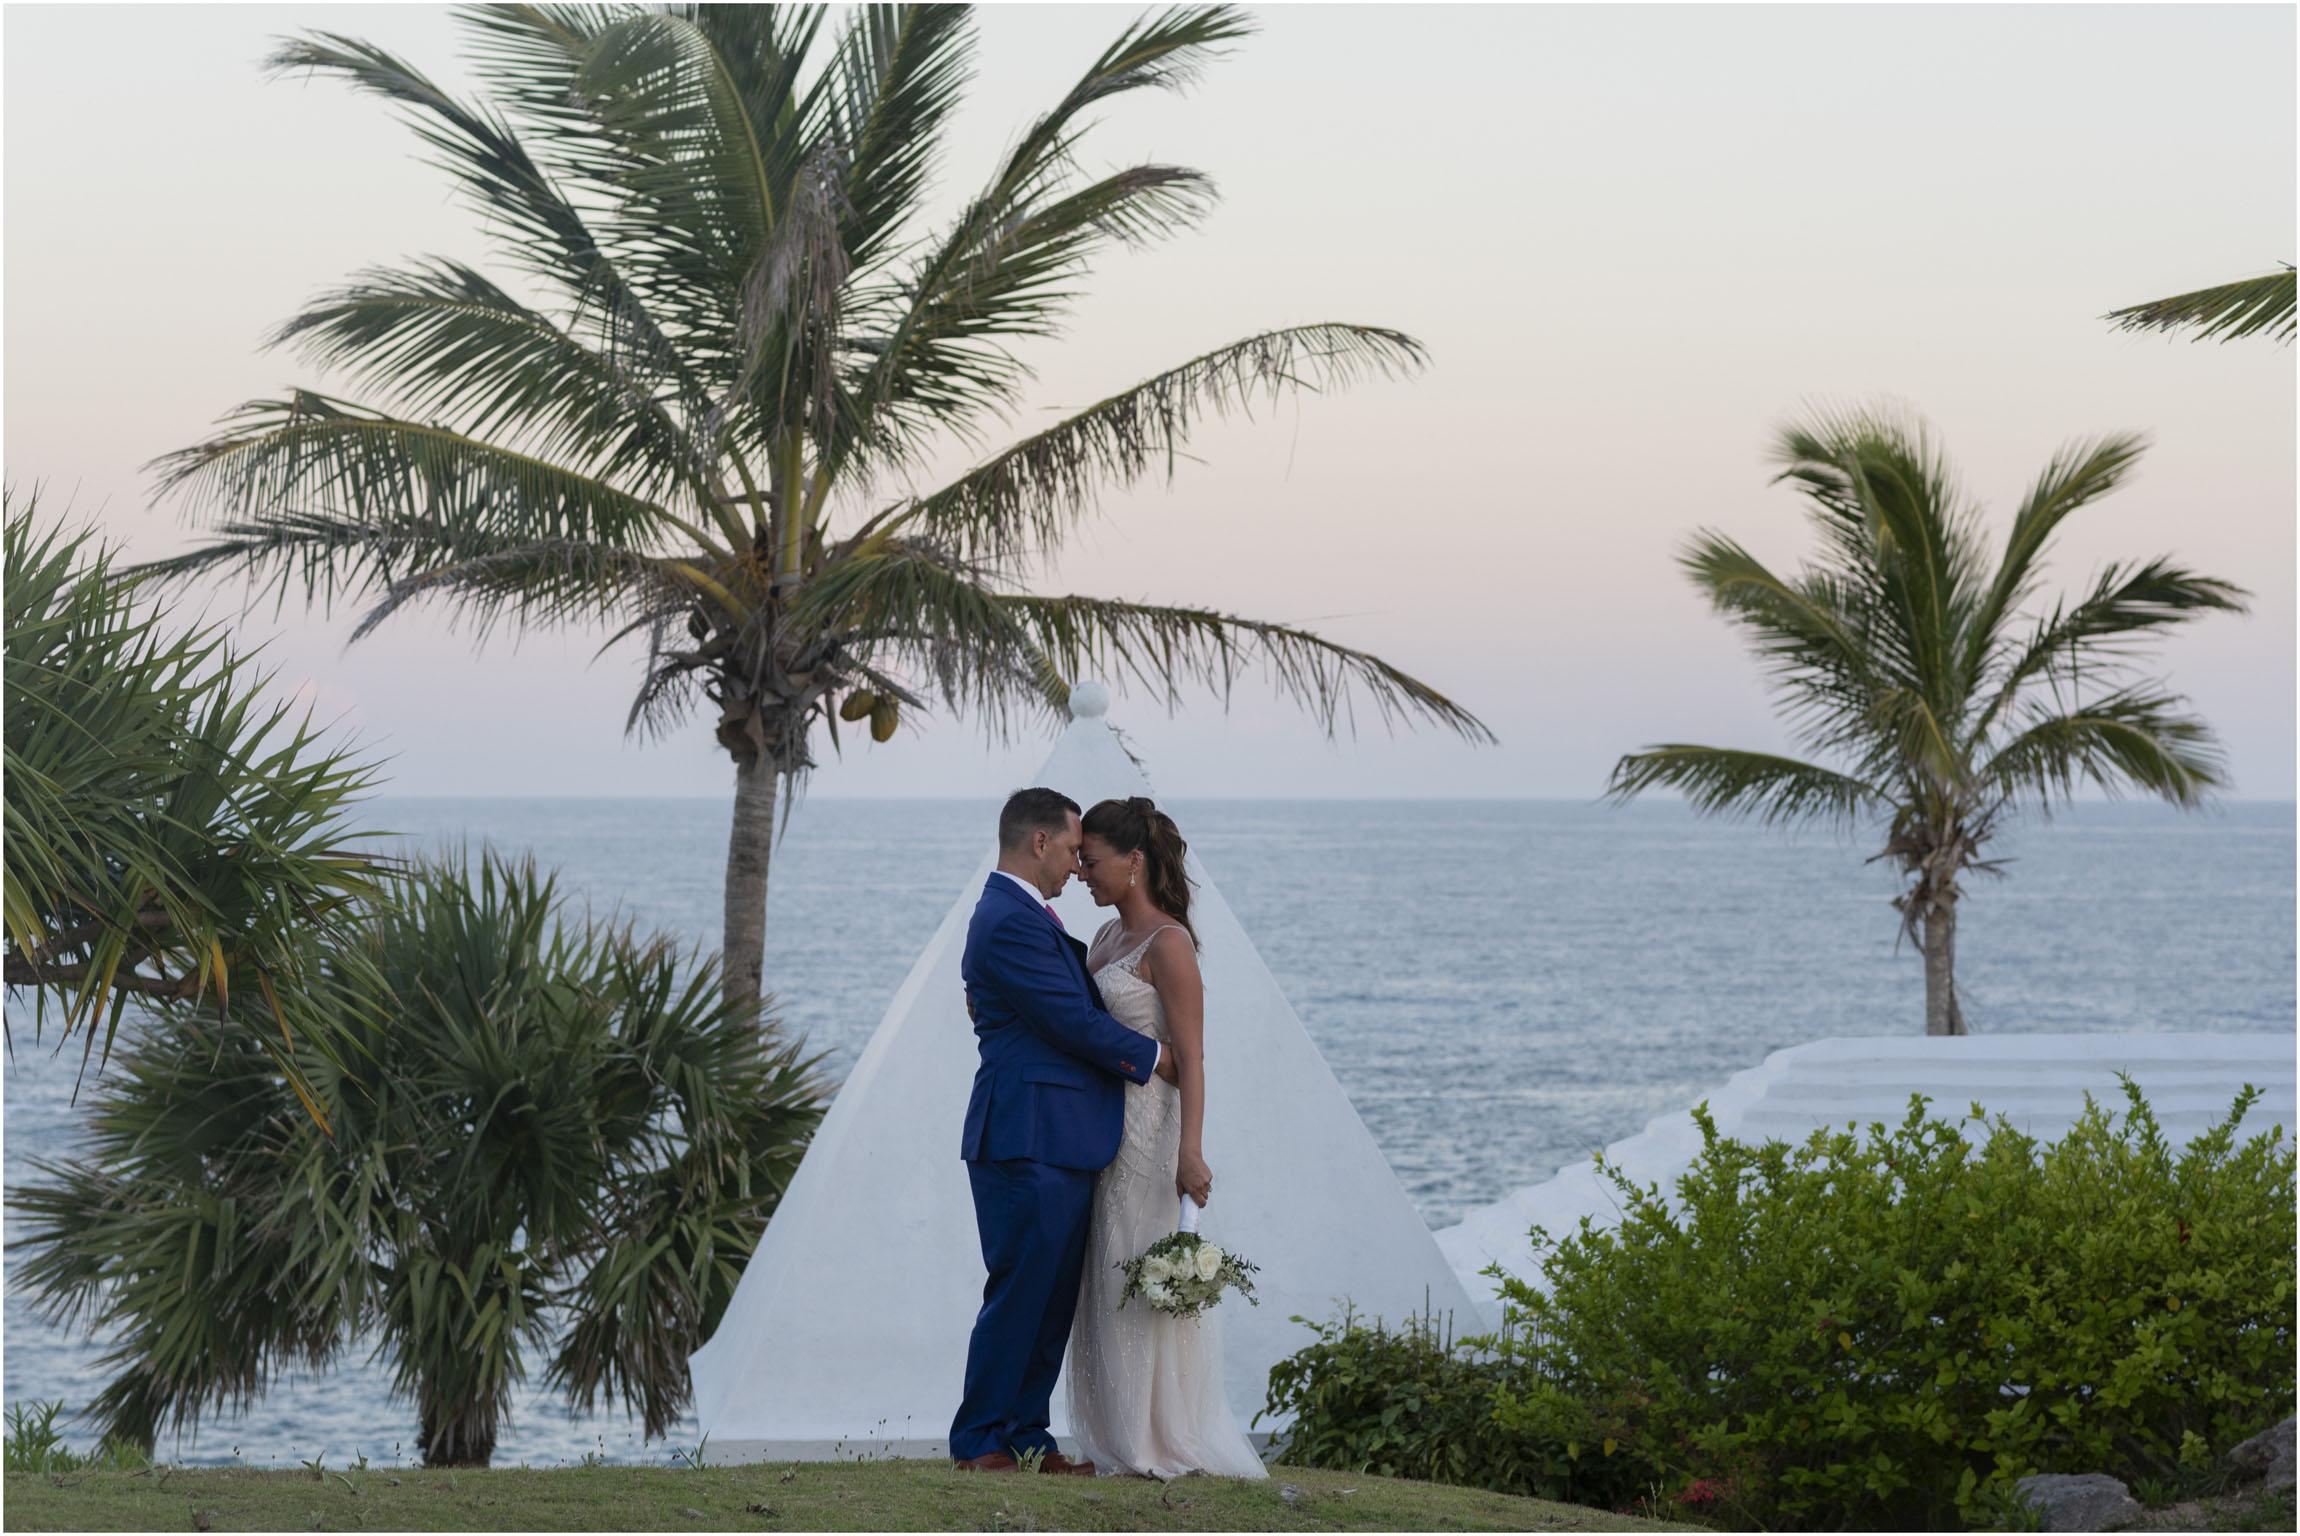 ©FianderFoto_Catherine_Kenny_Coral+Beach+Wedding_188.jpg